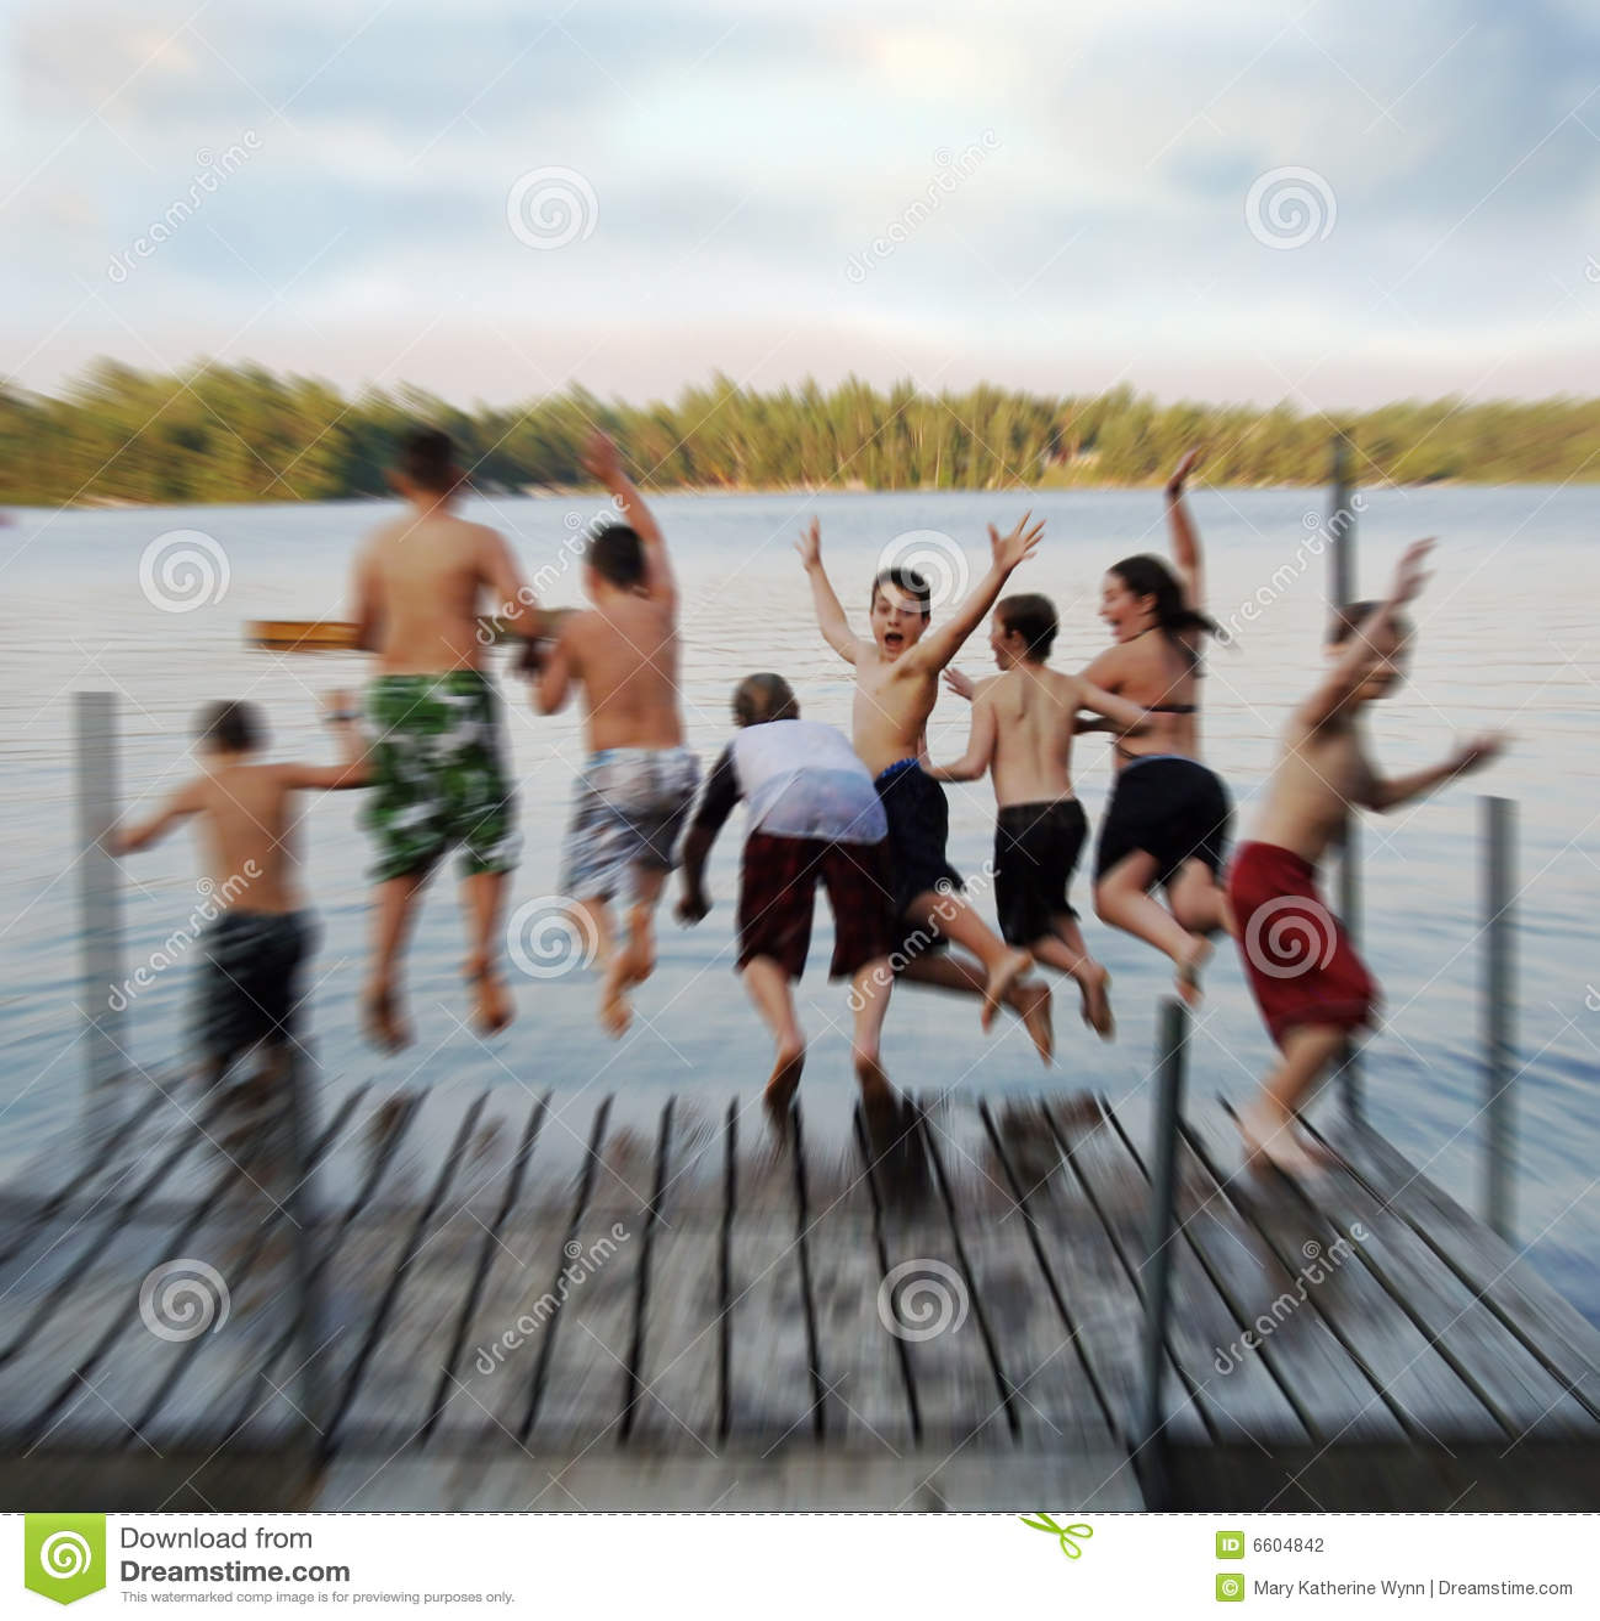 Summer camp blur